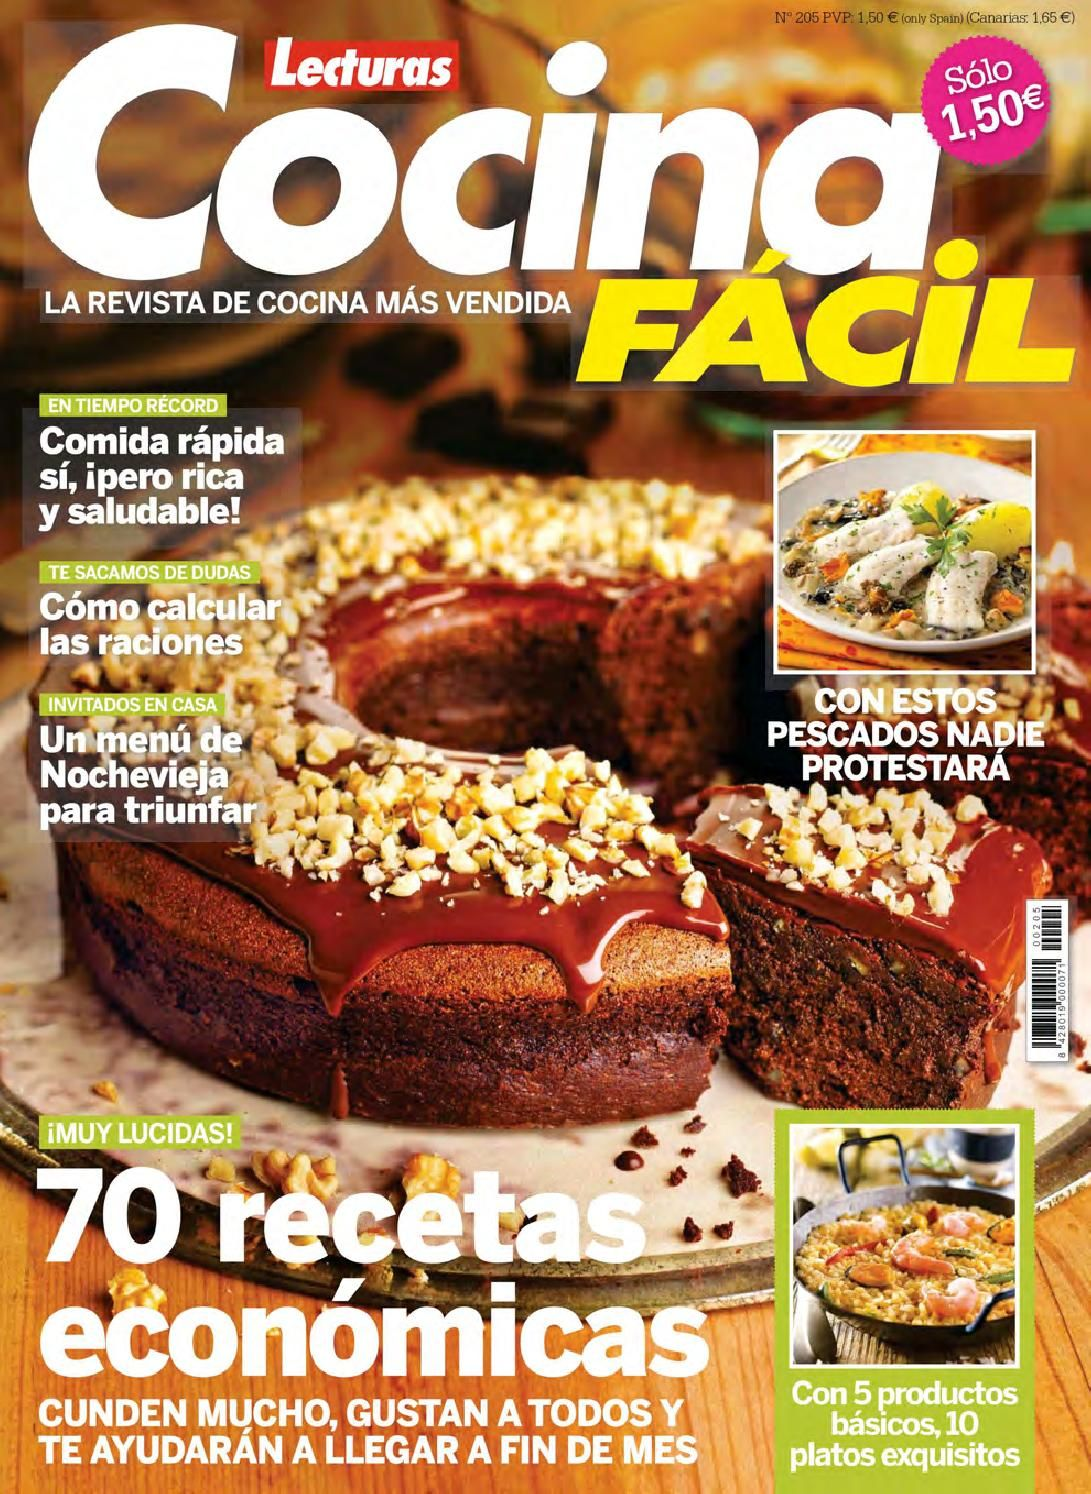 Cocina Facil Lecturas Enero 2015 R Cocina Facil Revistas De